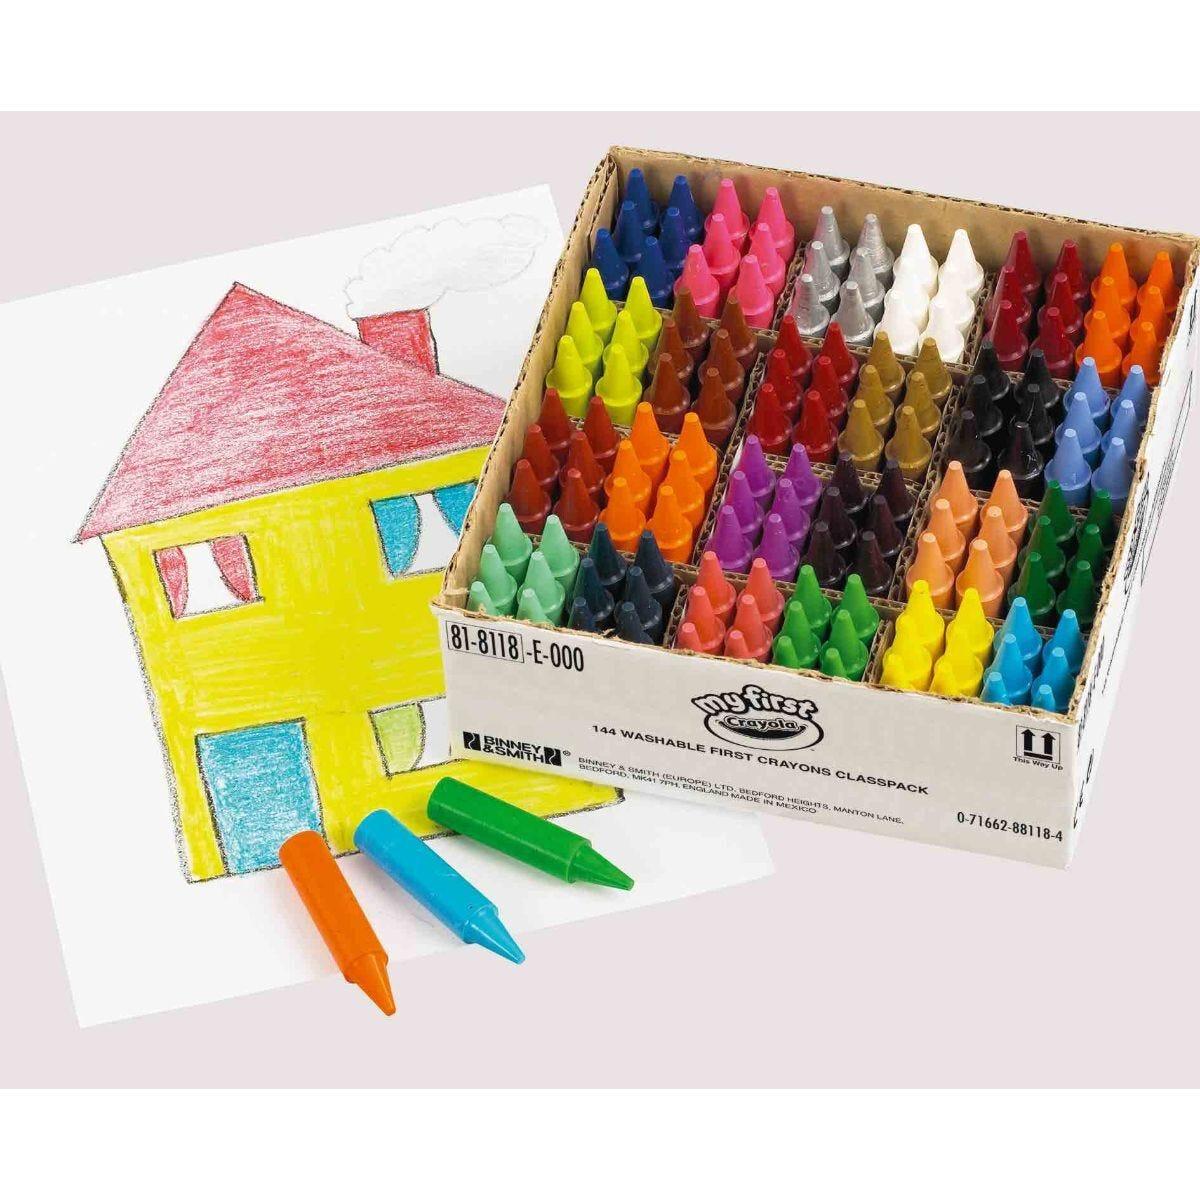 My First Crayola Crayon Classpack of 144